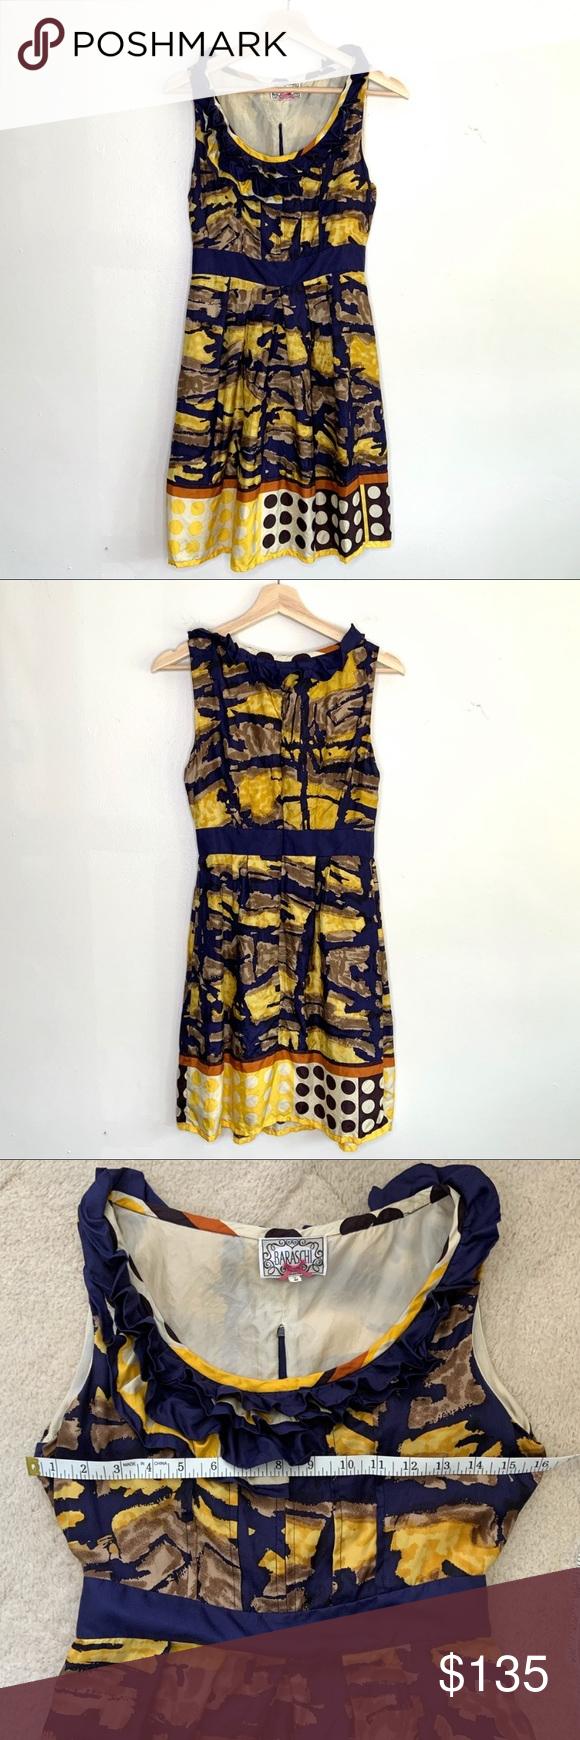 Yoana Baraschi Isla Dorada Blue And Yellow Dress Blue And Yellow Dress Yellow Dress Anthropologie Dress [ 1740 x 580 Pixel ]